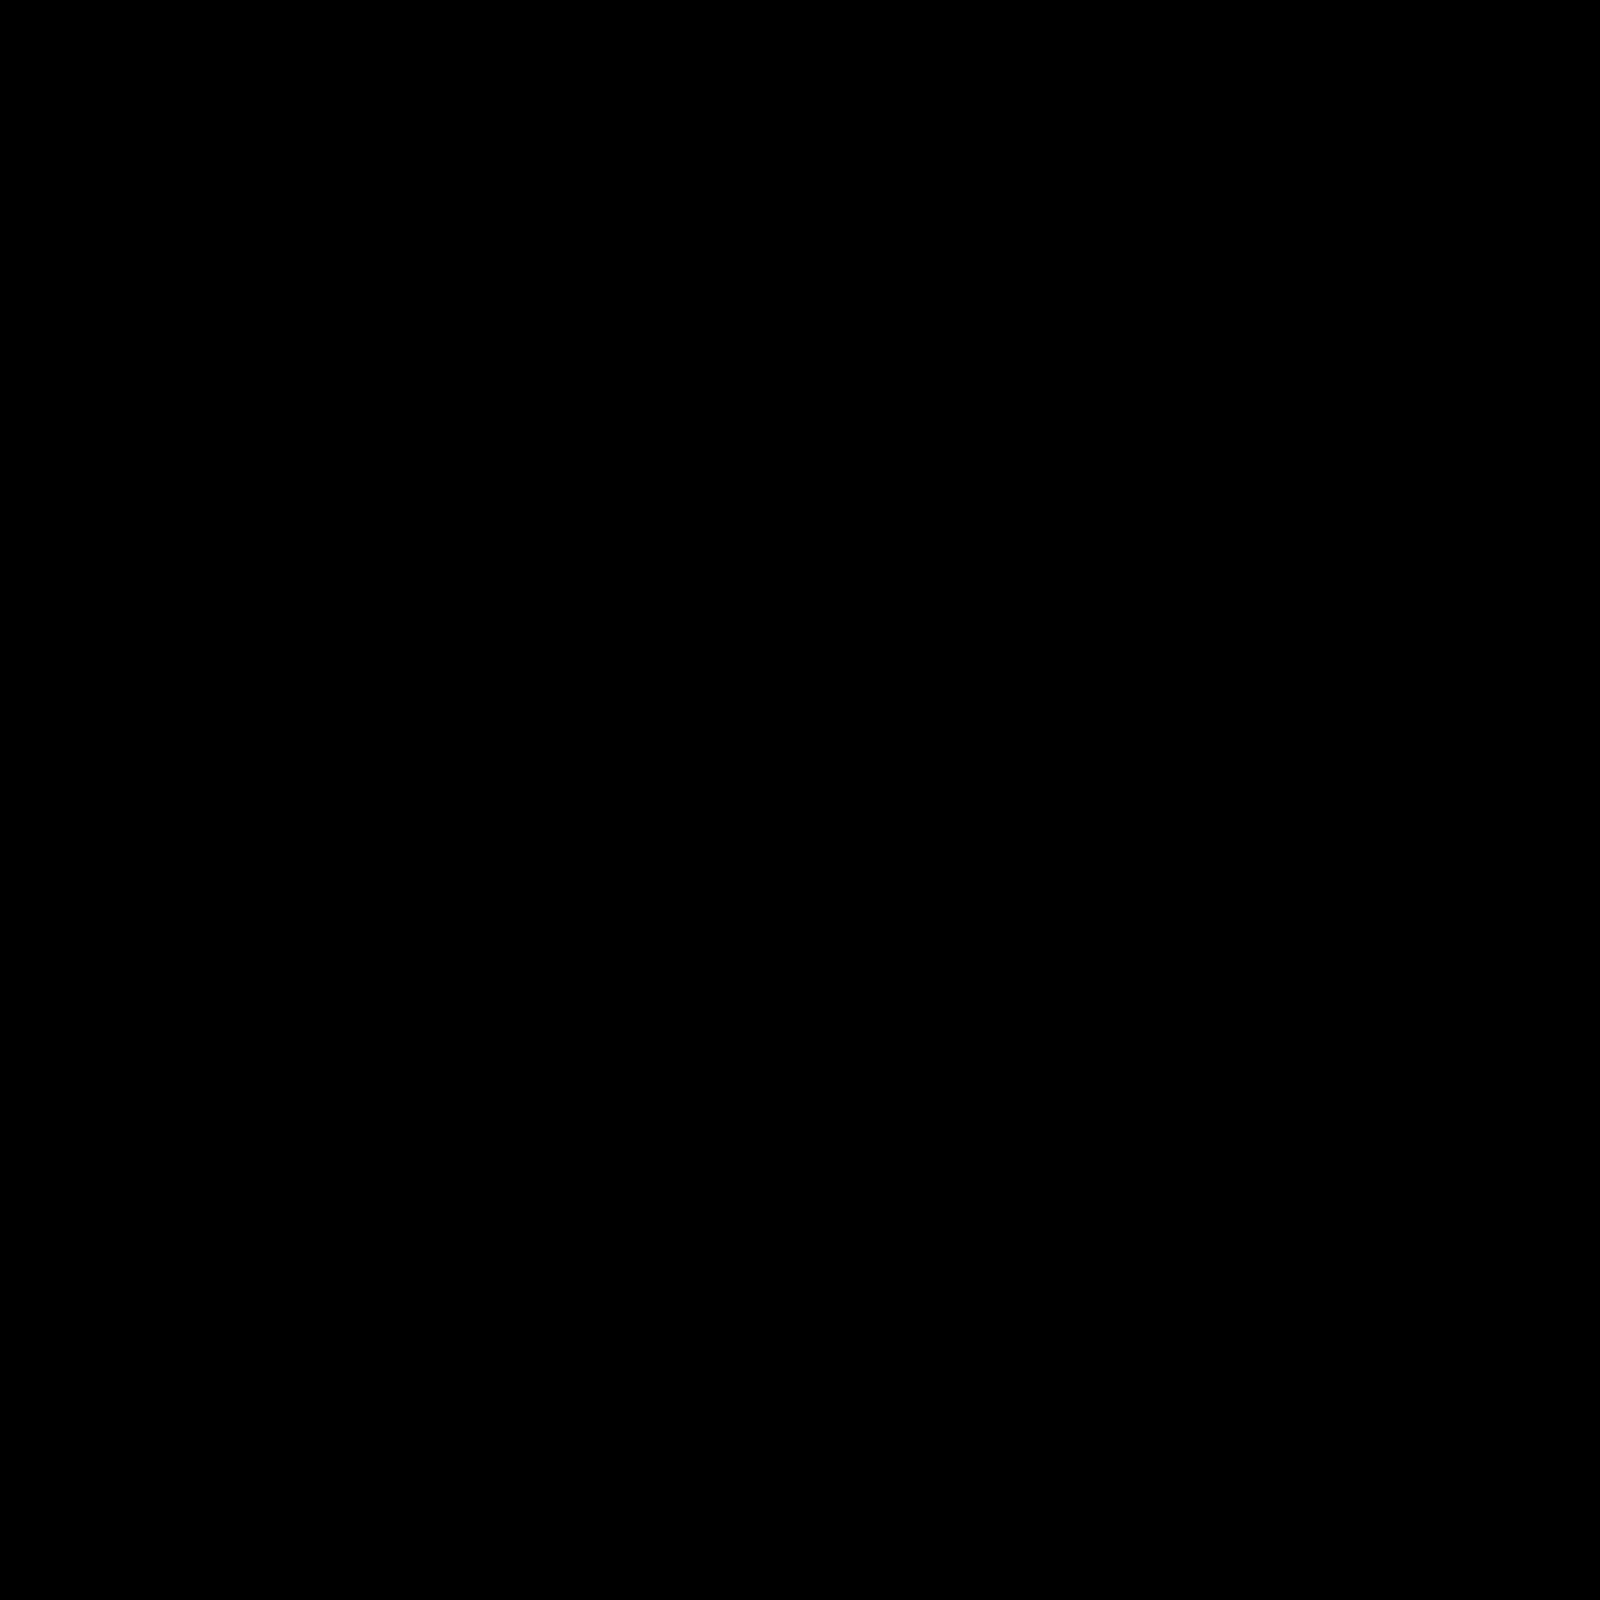 Metaliczna farba icon